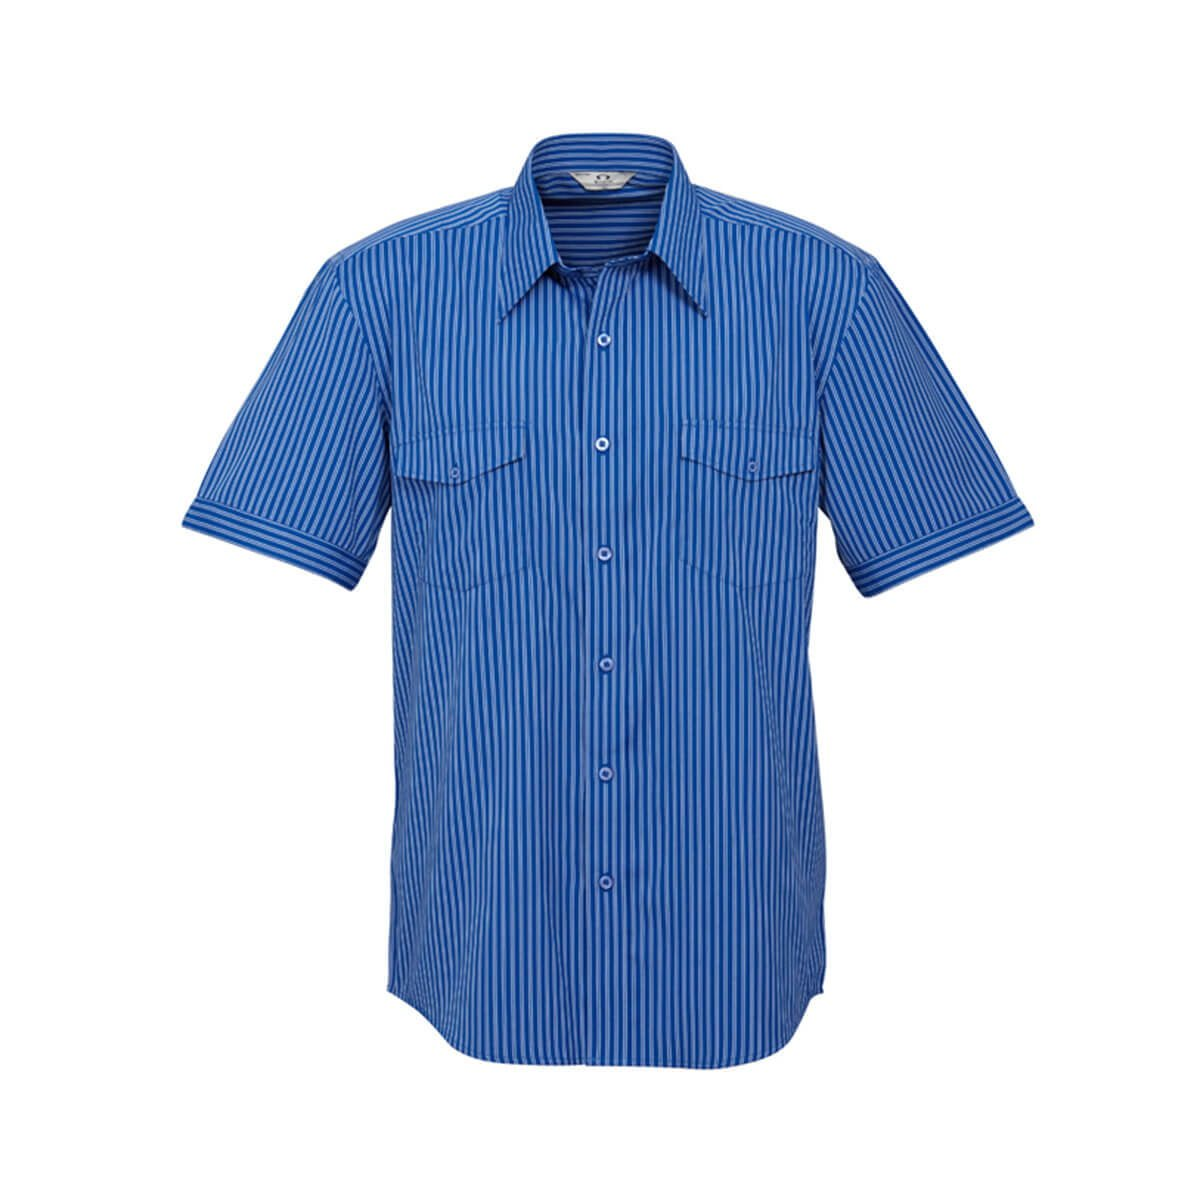 Mens Cuban Short Sleeve Shirt-Indigo / Silver